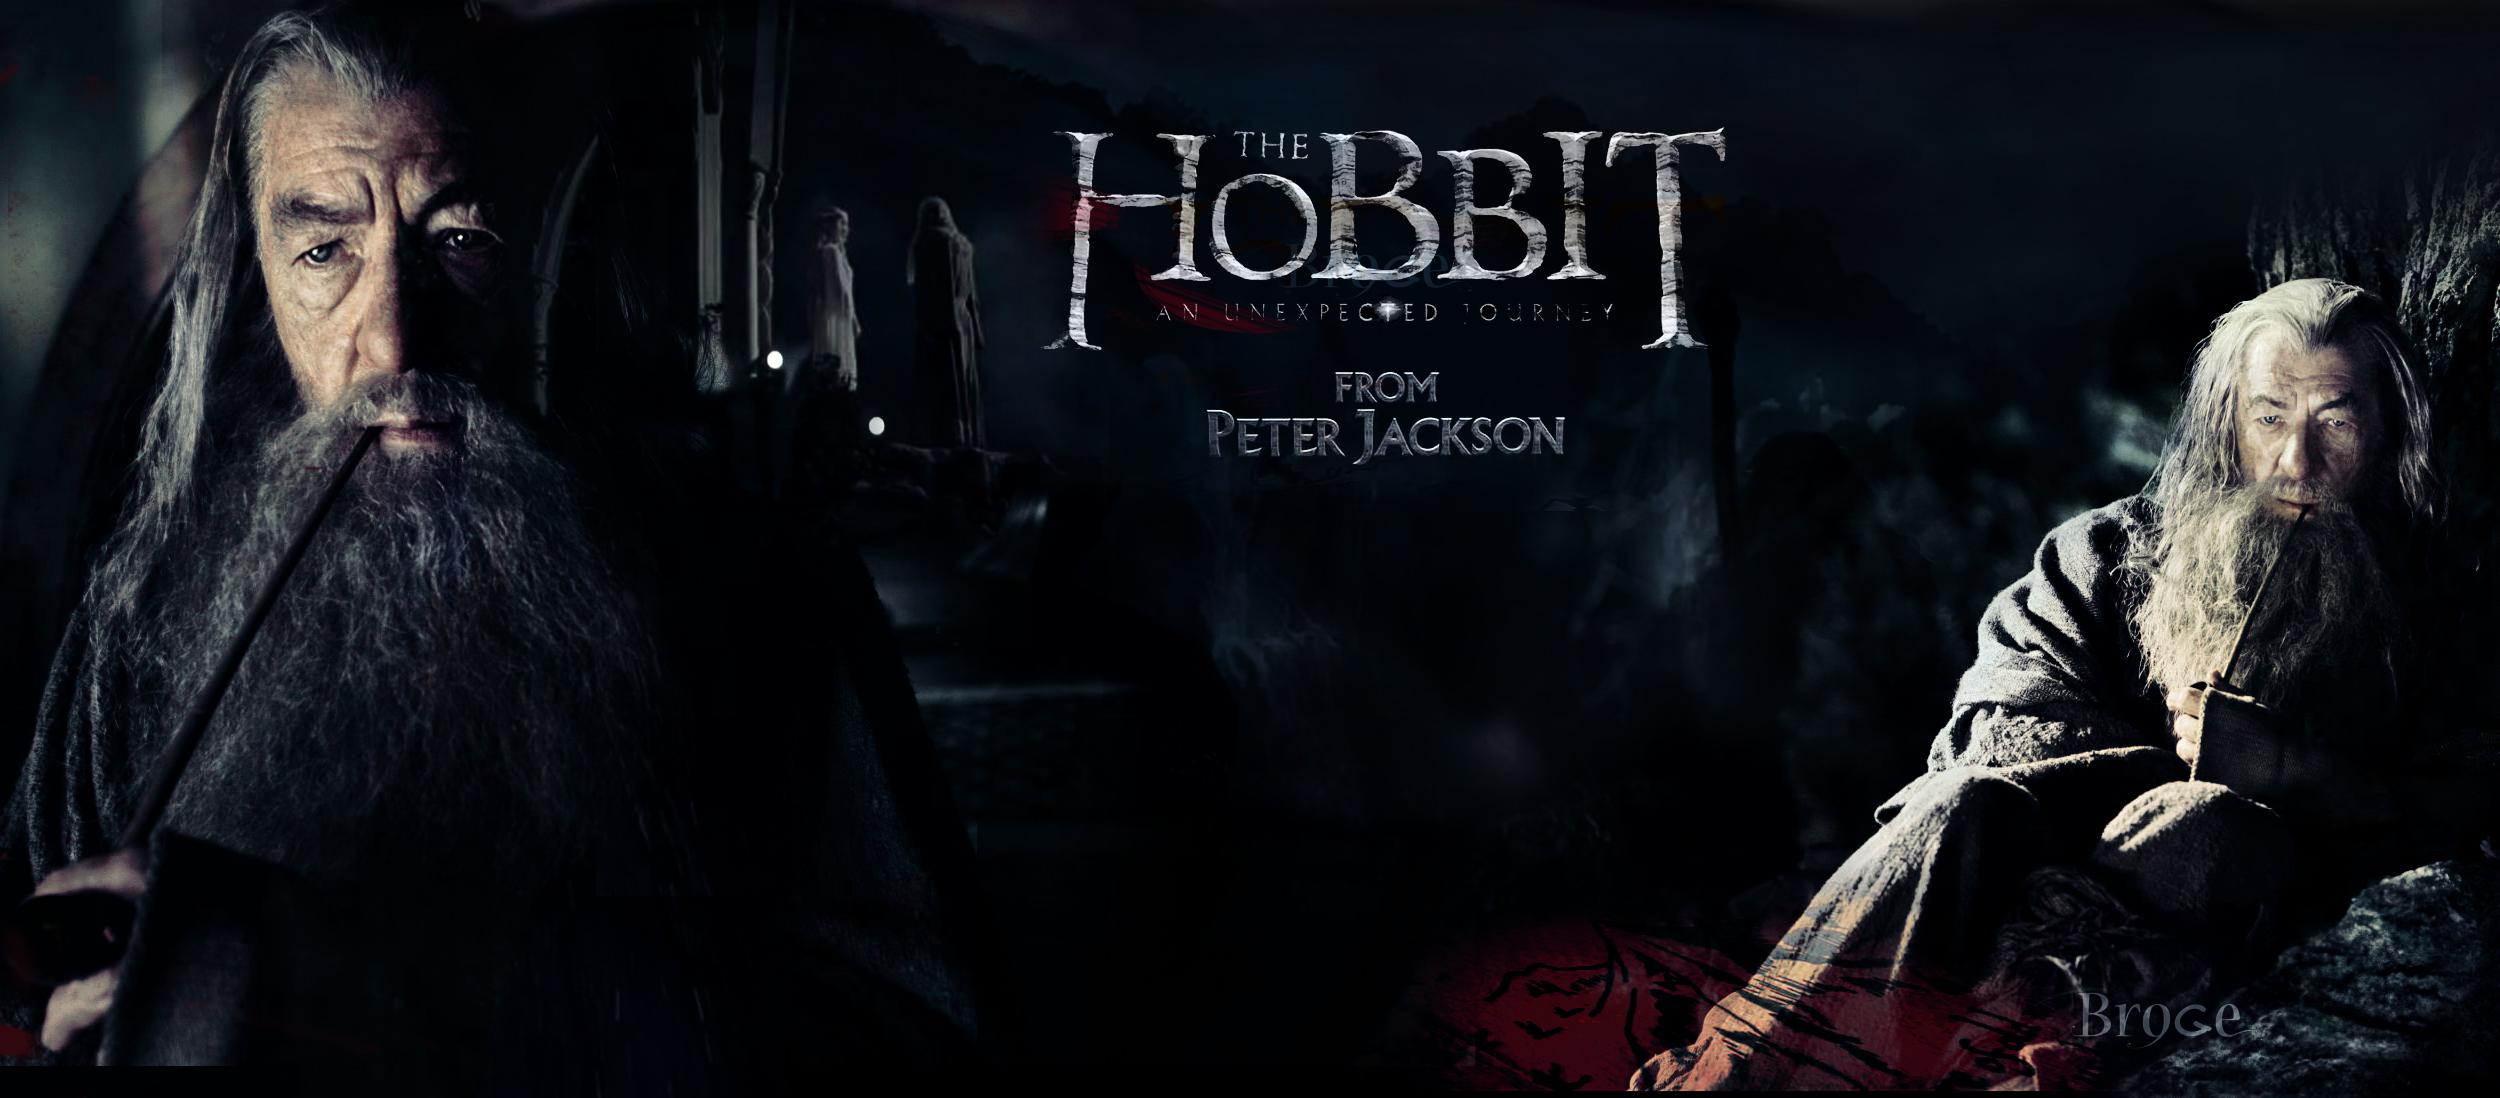 the hobbit beklenmedik yolculuk HD posterler